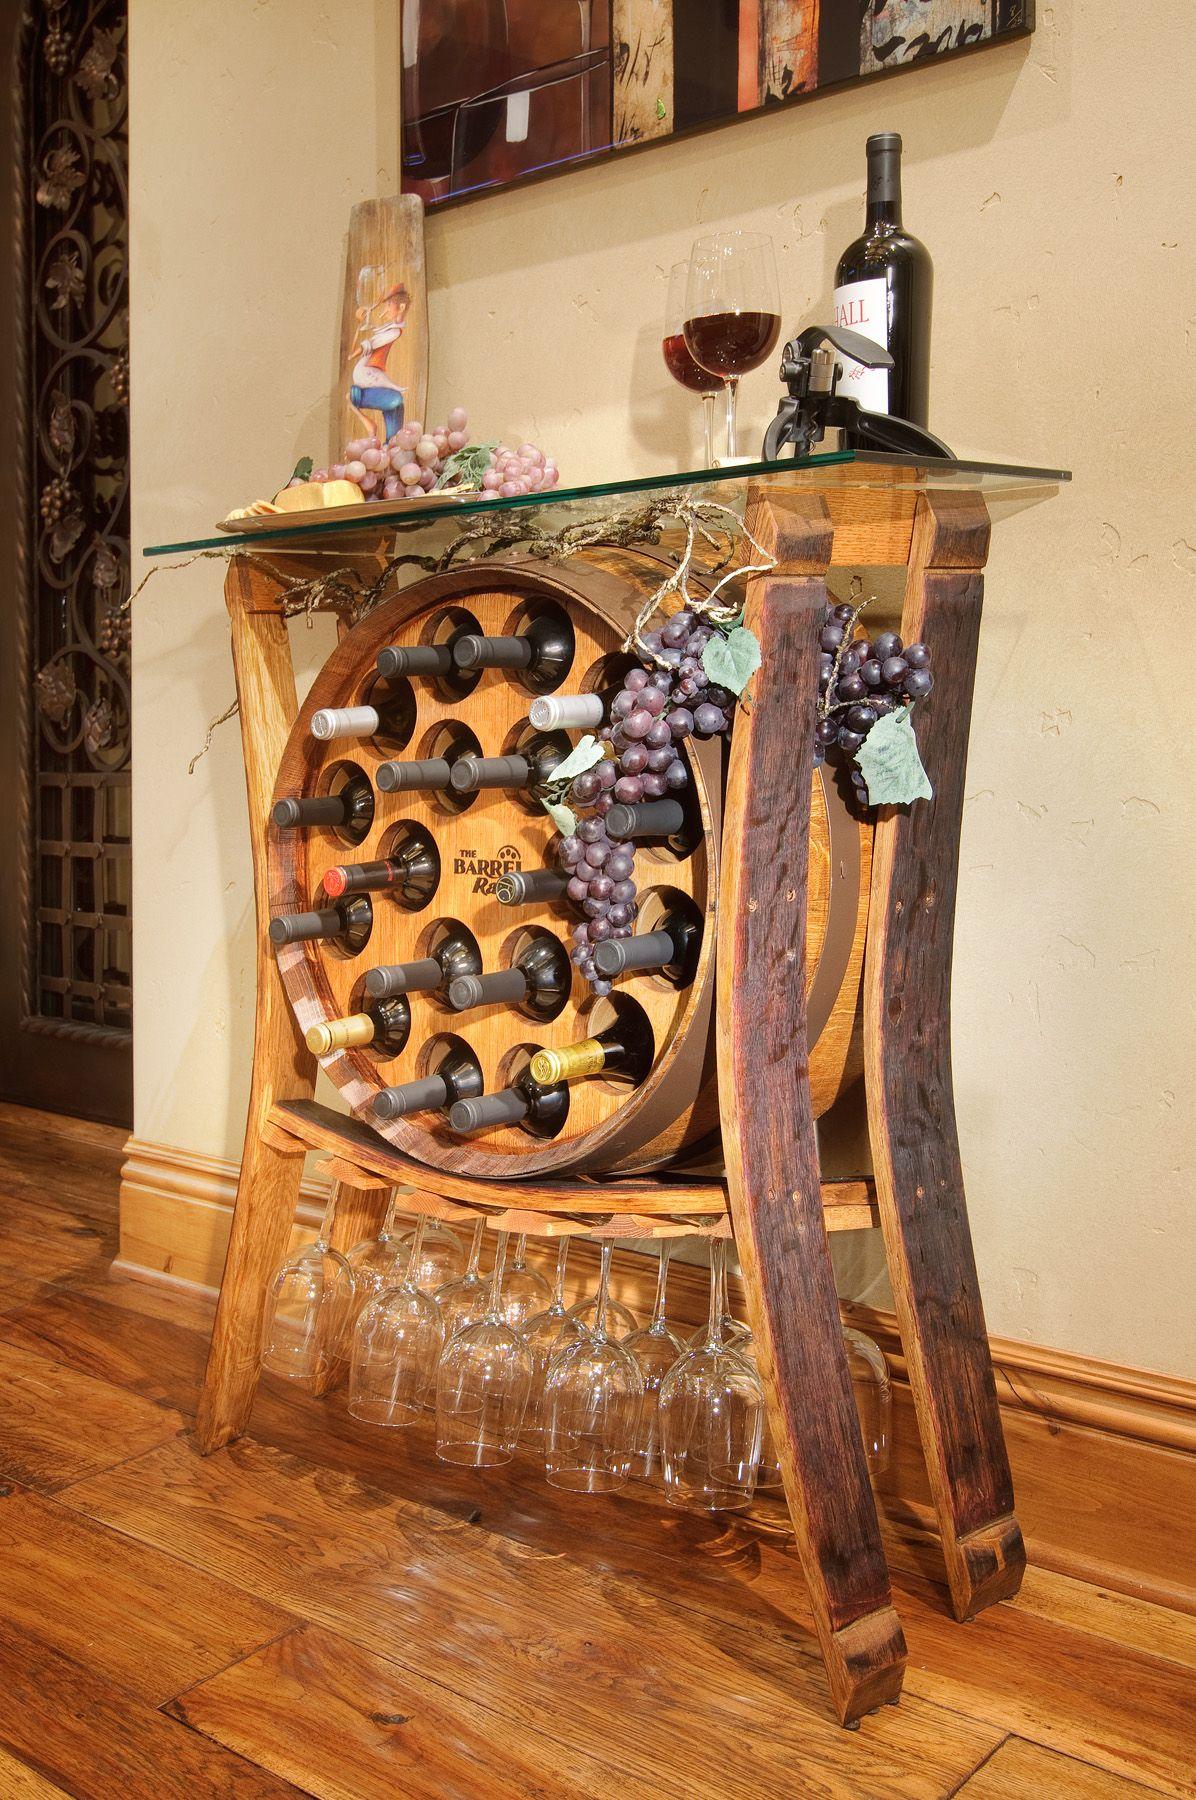 1000 images about wine barrel ideas on pinterest wine barrels wine barrel table and wine barrel furniture alpine wine design outdoor finish wine barrel